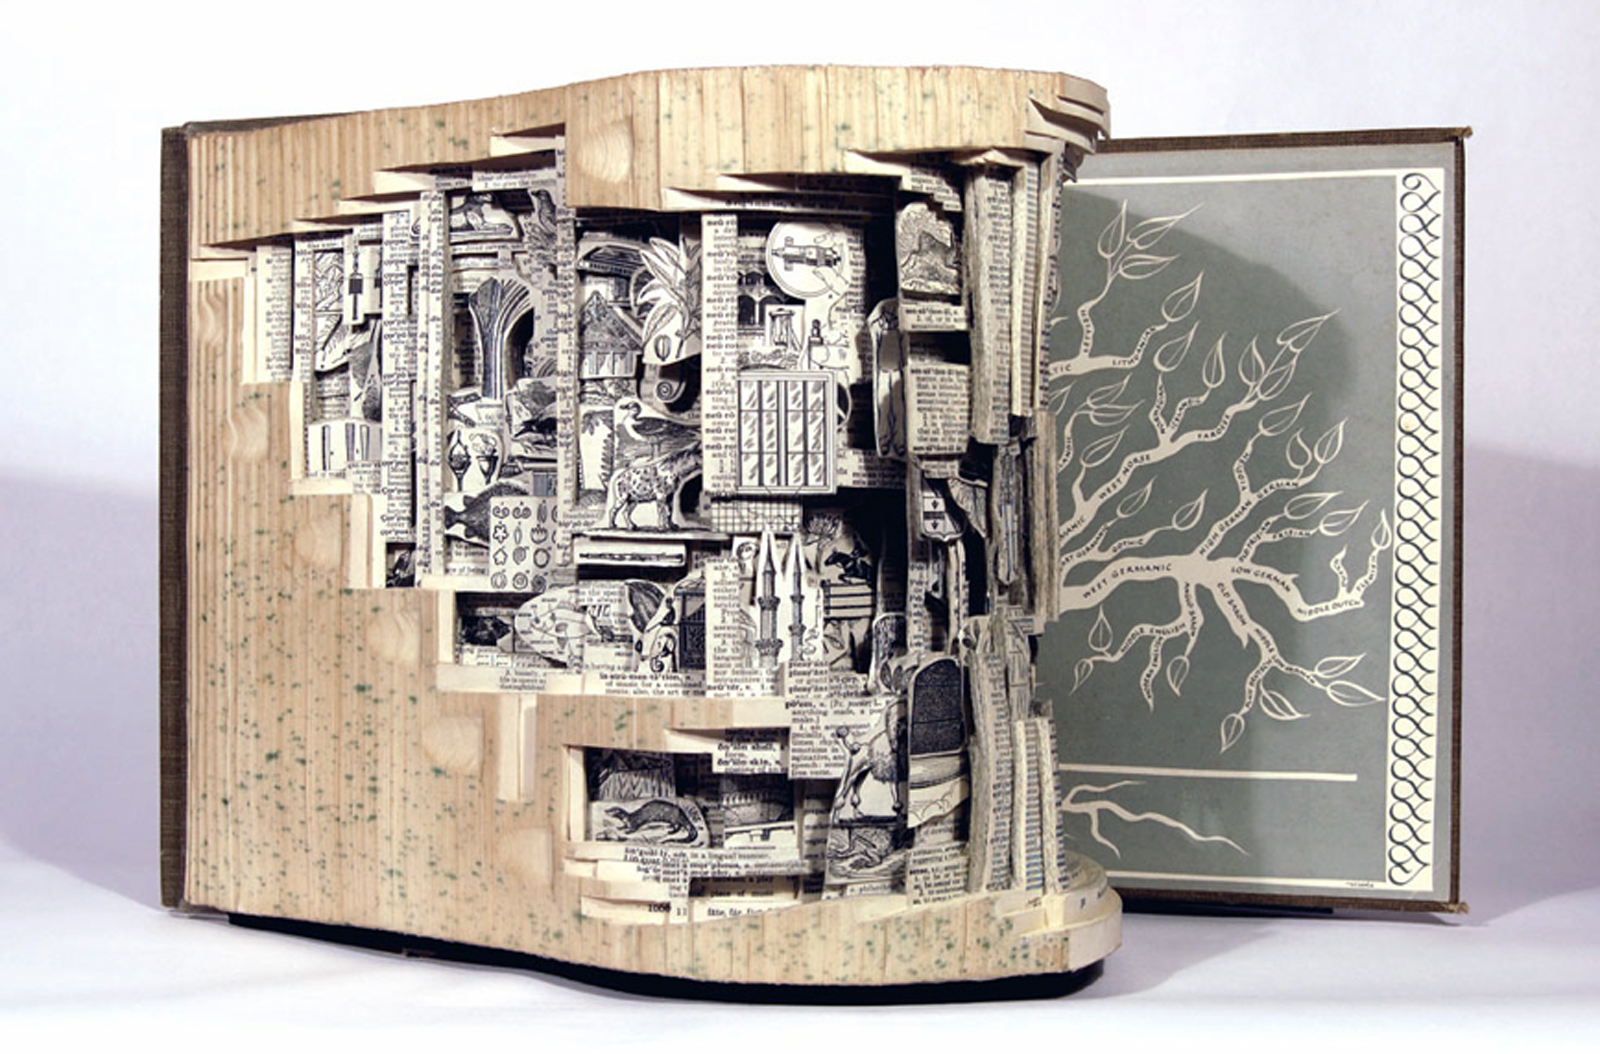 brian-dettmer-book-art